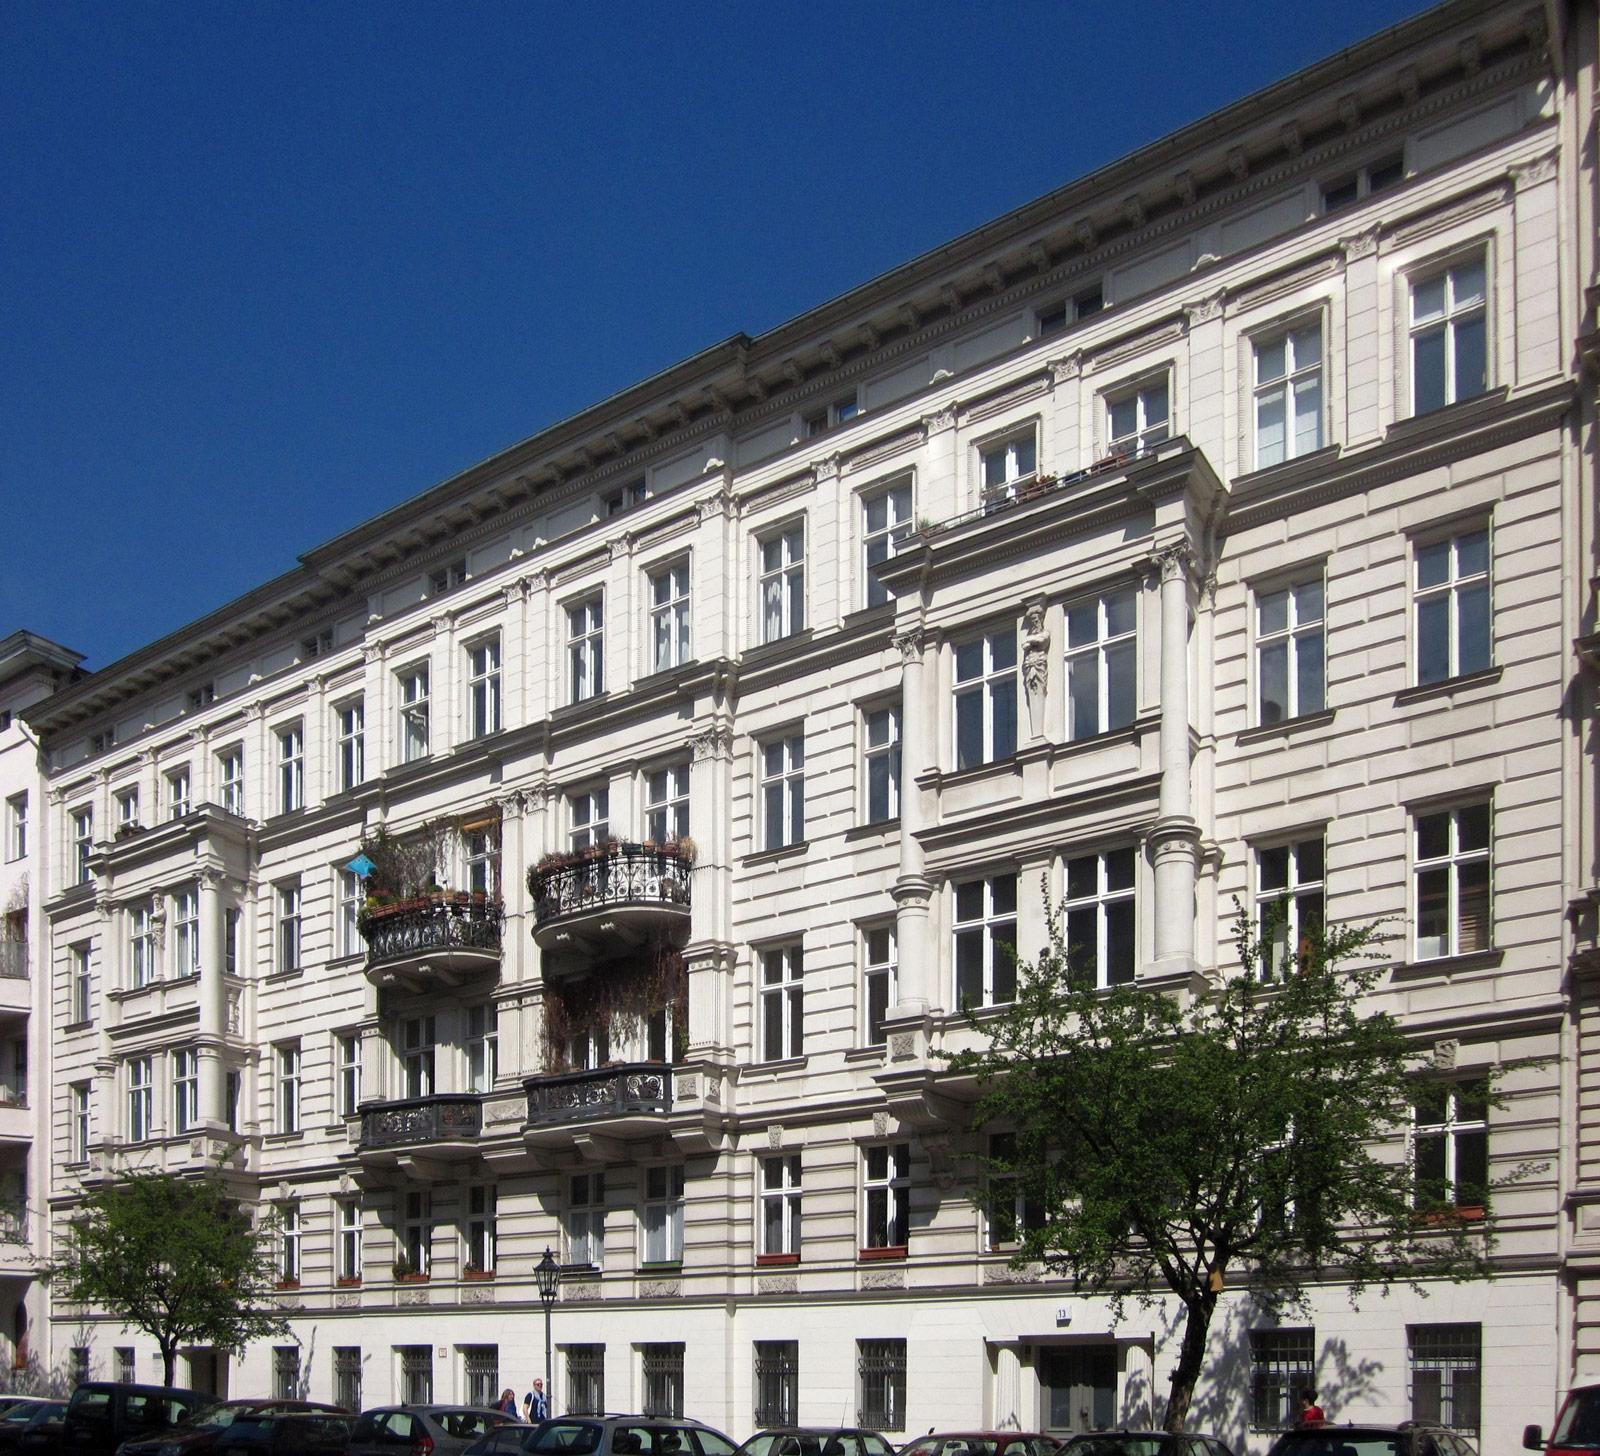 Zahnarzt Berlin Kreuzberg - Bergmannkiez, Mehringdamm, Viktoriapark